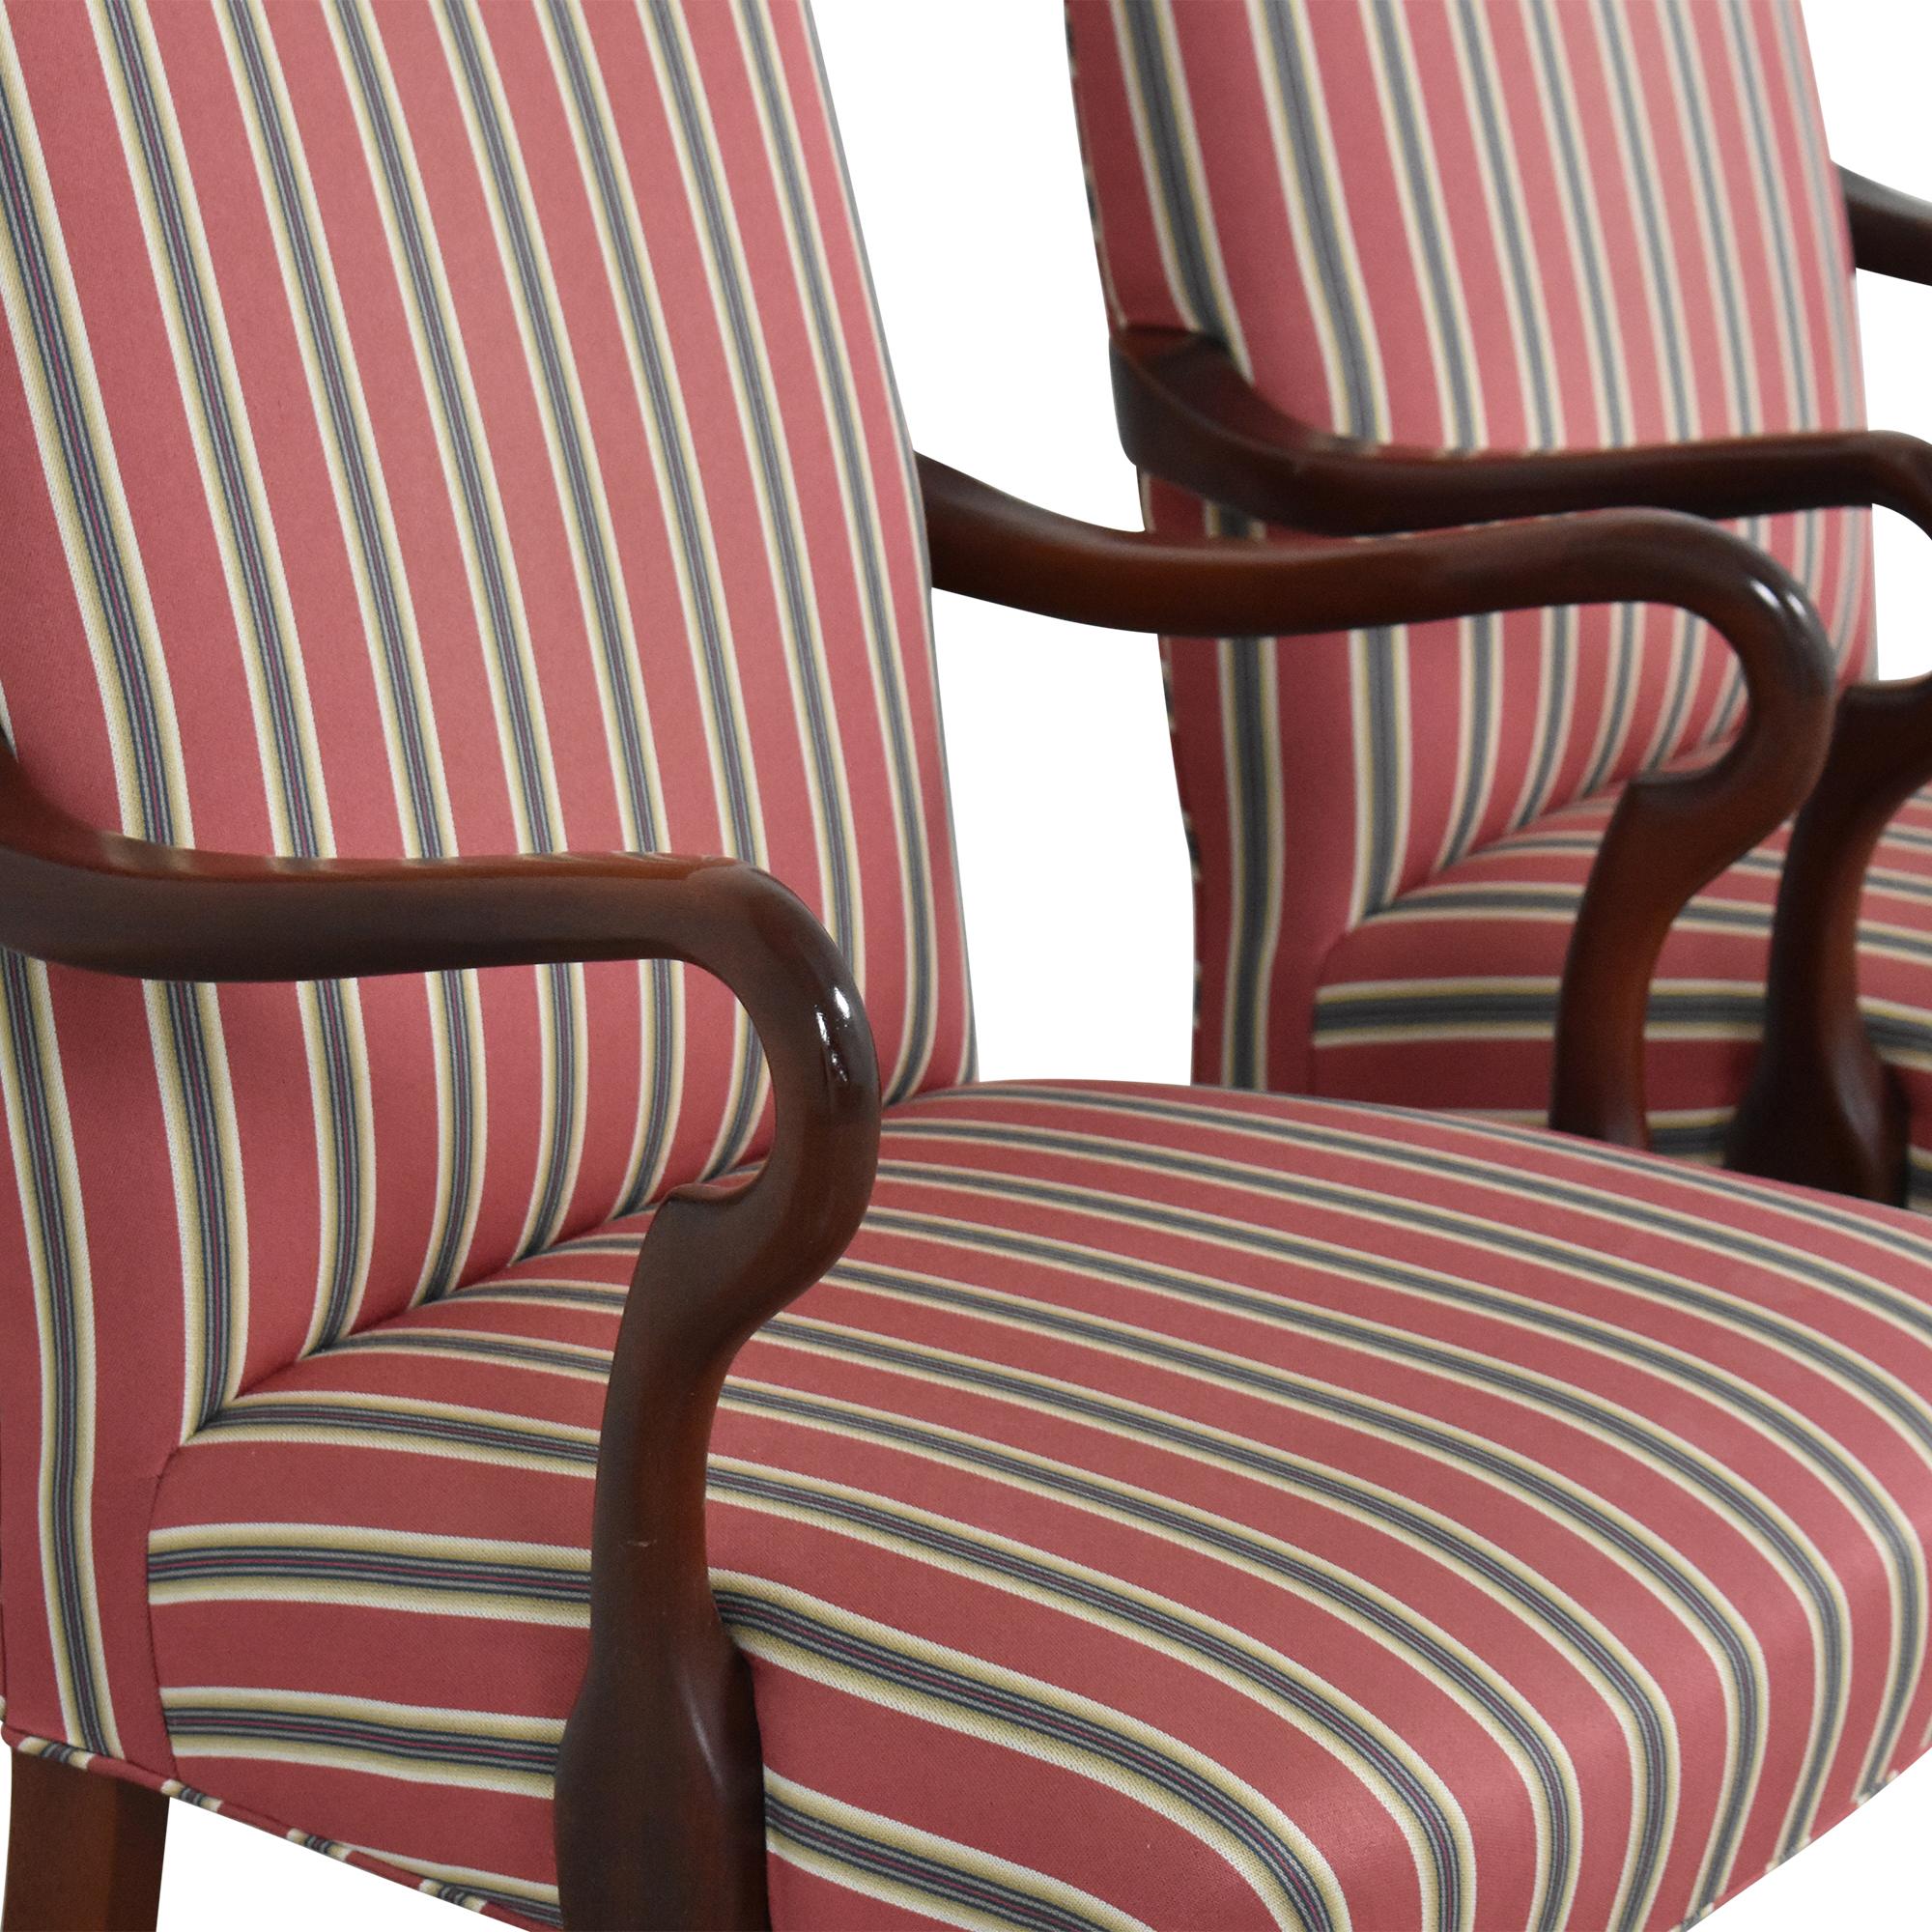 shop Haworth Stripe Dining Arm Chairs Haworth Chairs